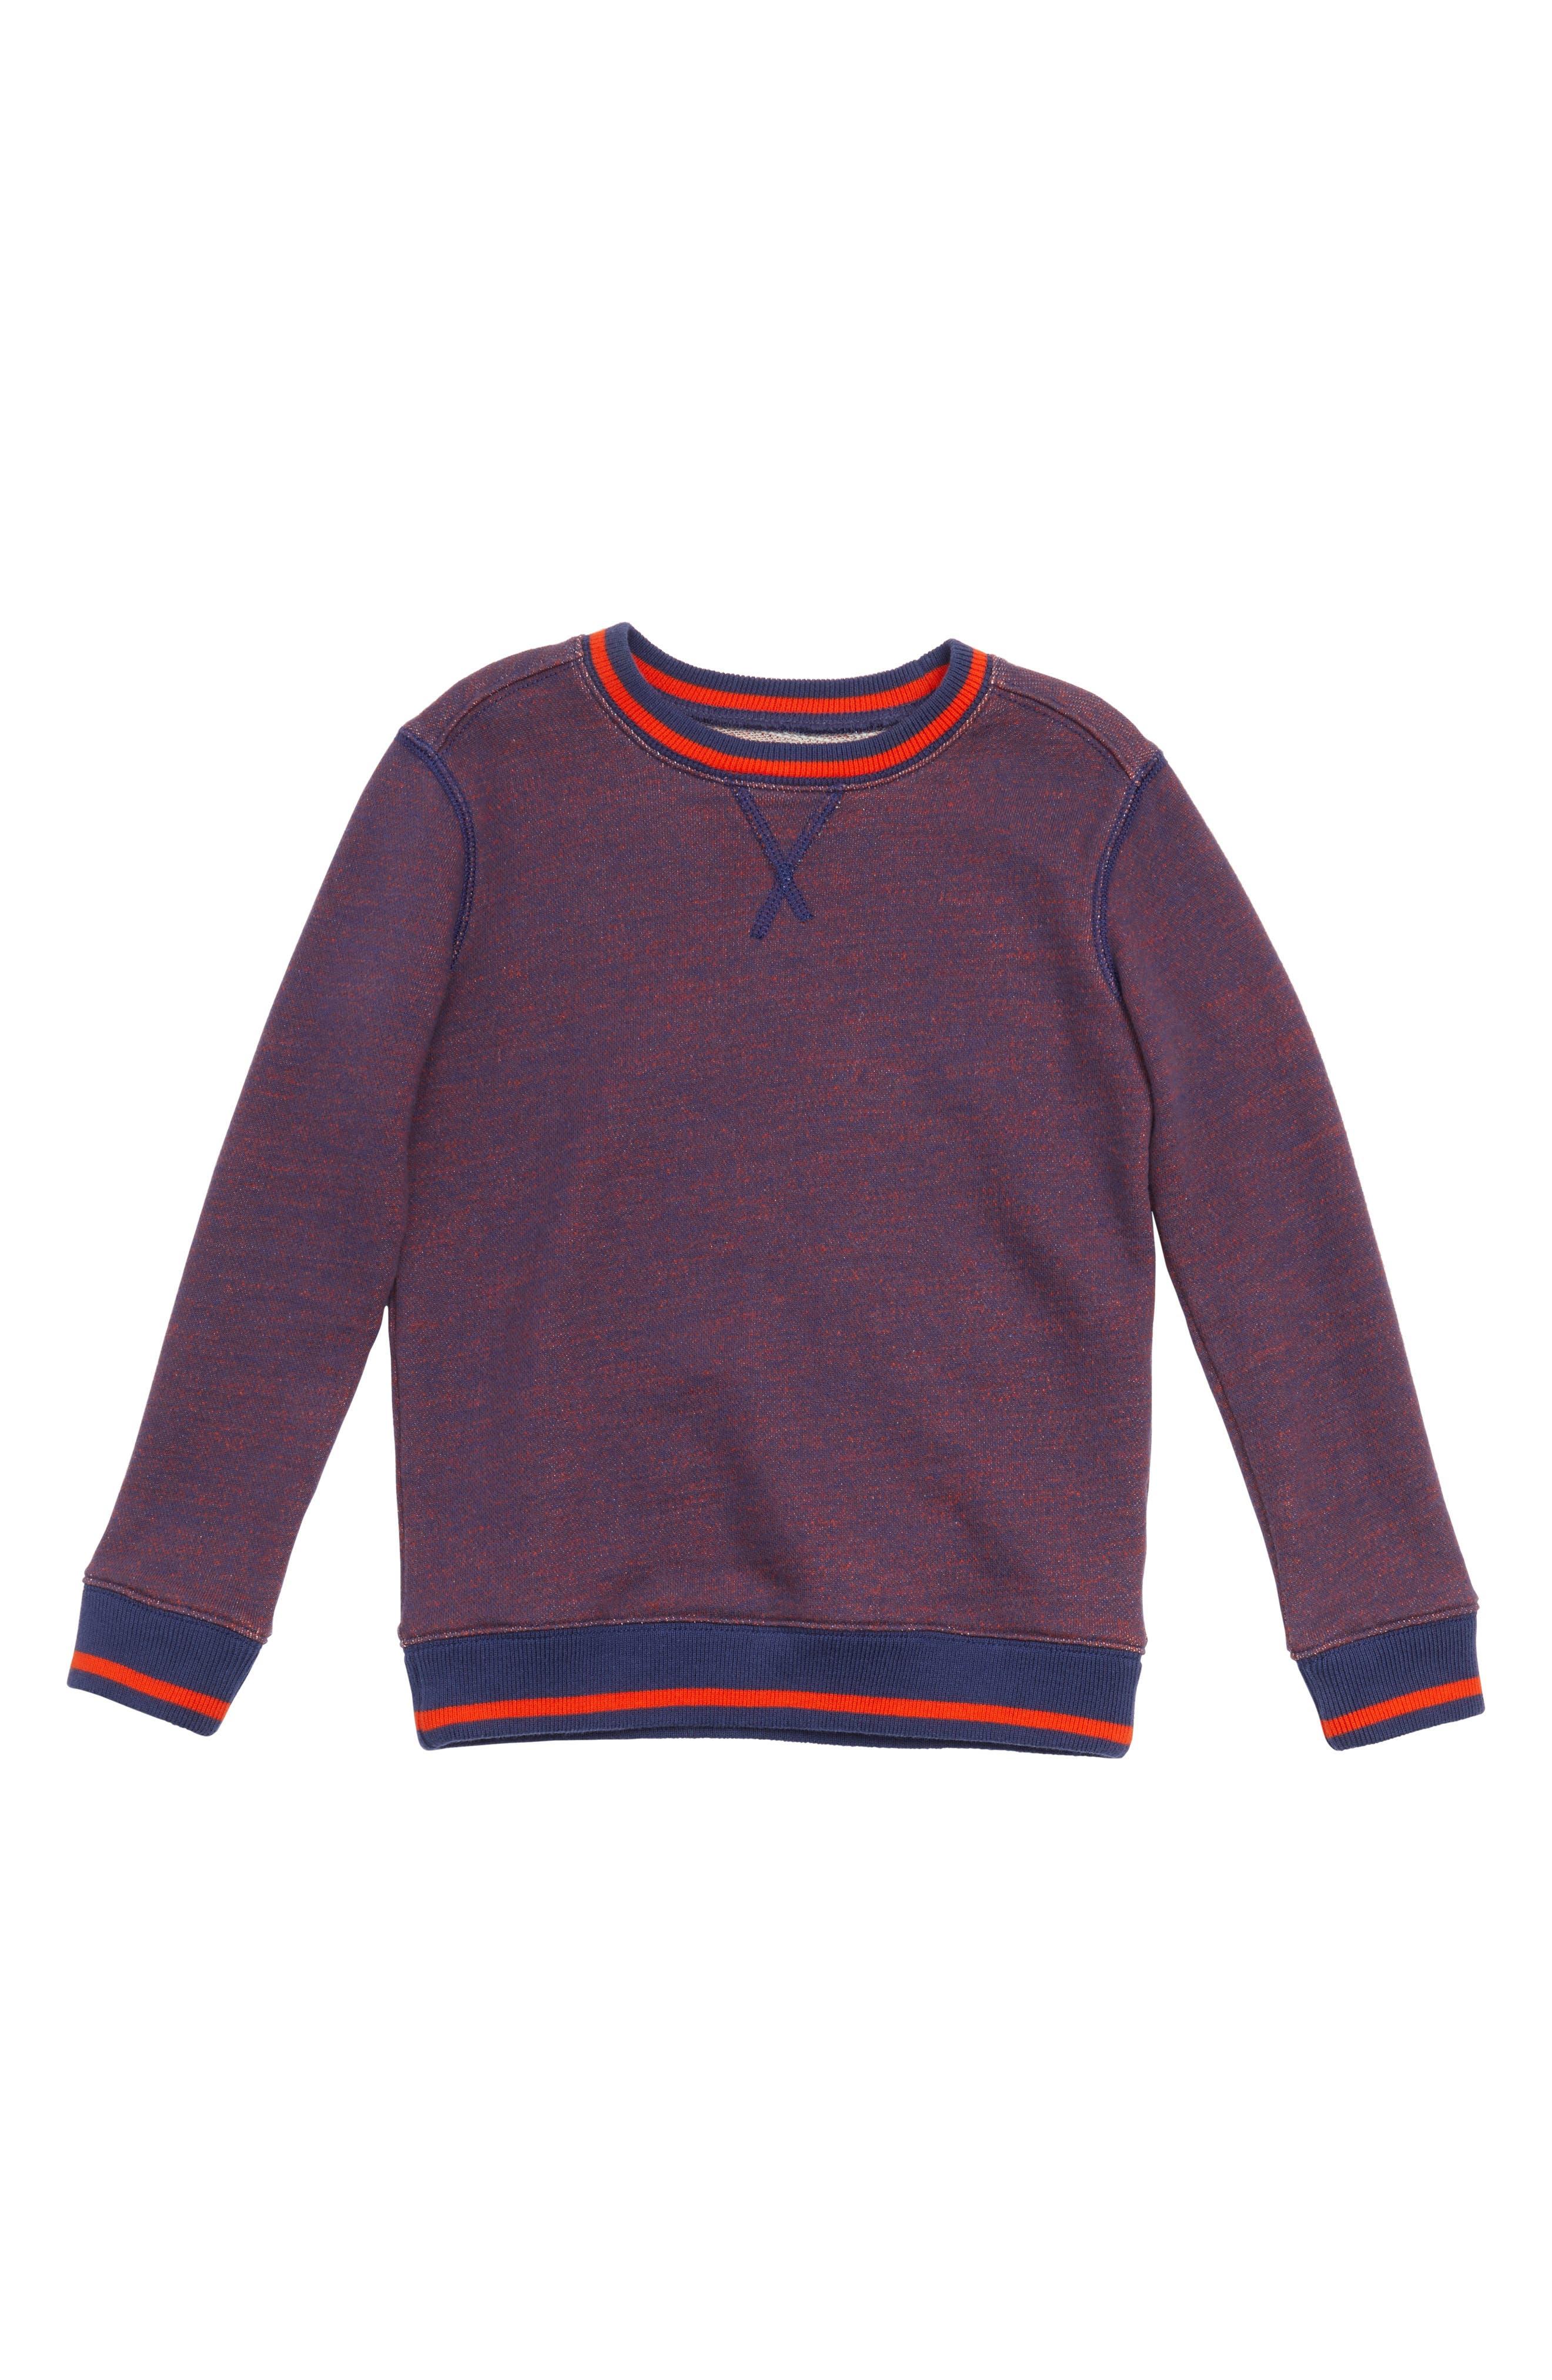 Tucker + Tate Crewneck Sweatshirt (Toddler Boys & Little Boys)